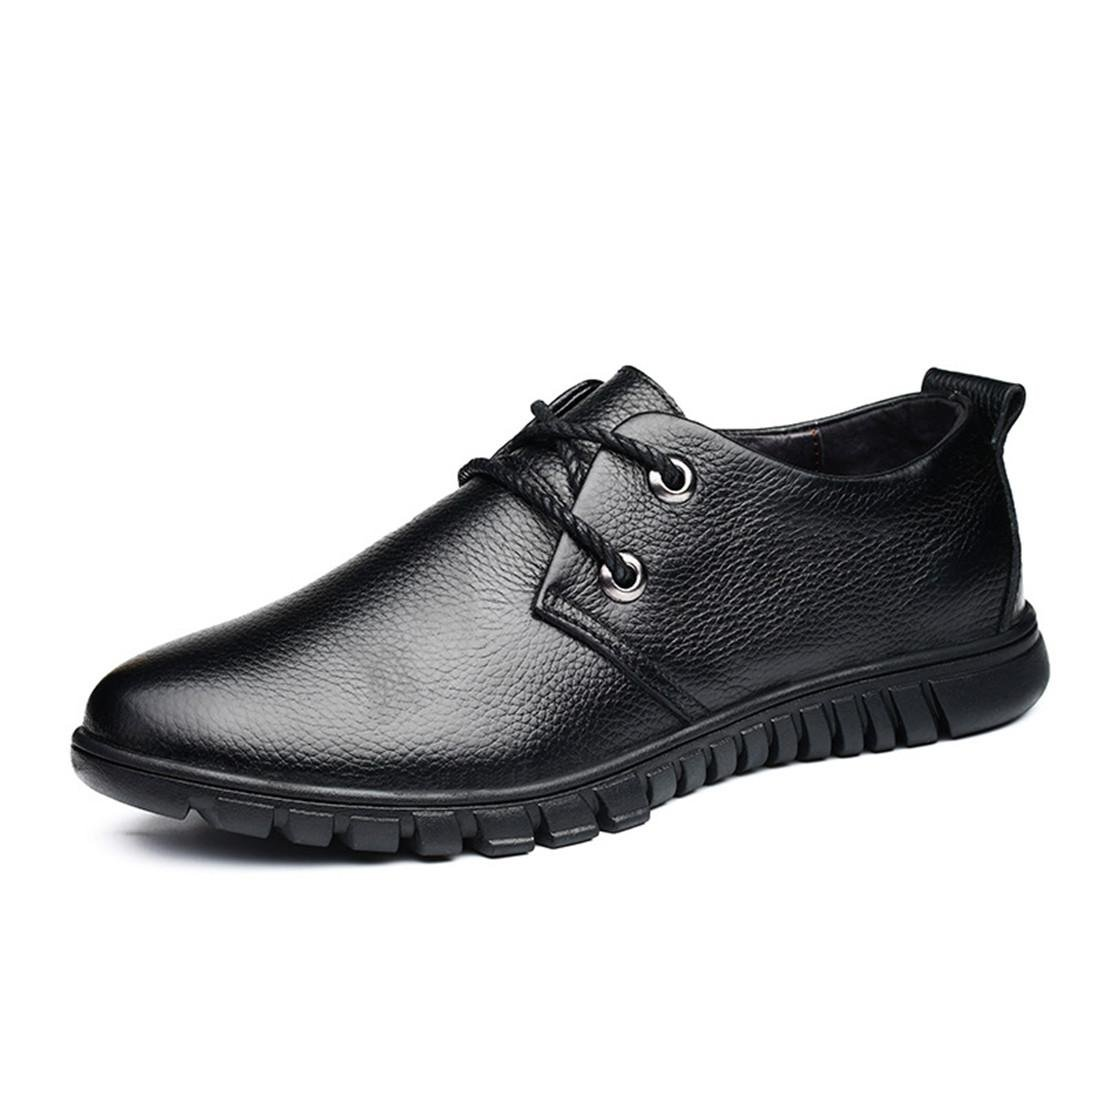 Herren Rutschfest Freizeit Flache Schuhe Lederschuhe Licht Atmungsaktiv Lässige Schuhe EUR GRÖSSE 38-45